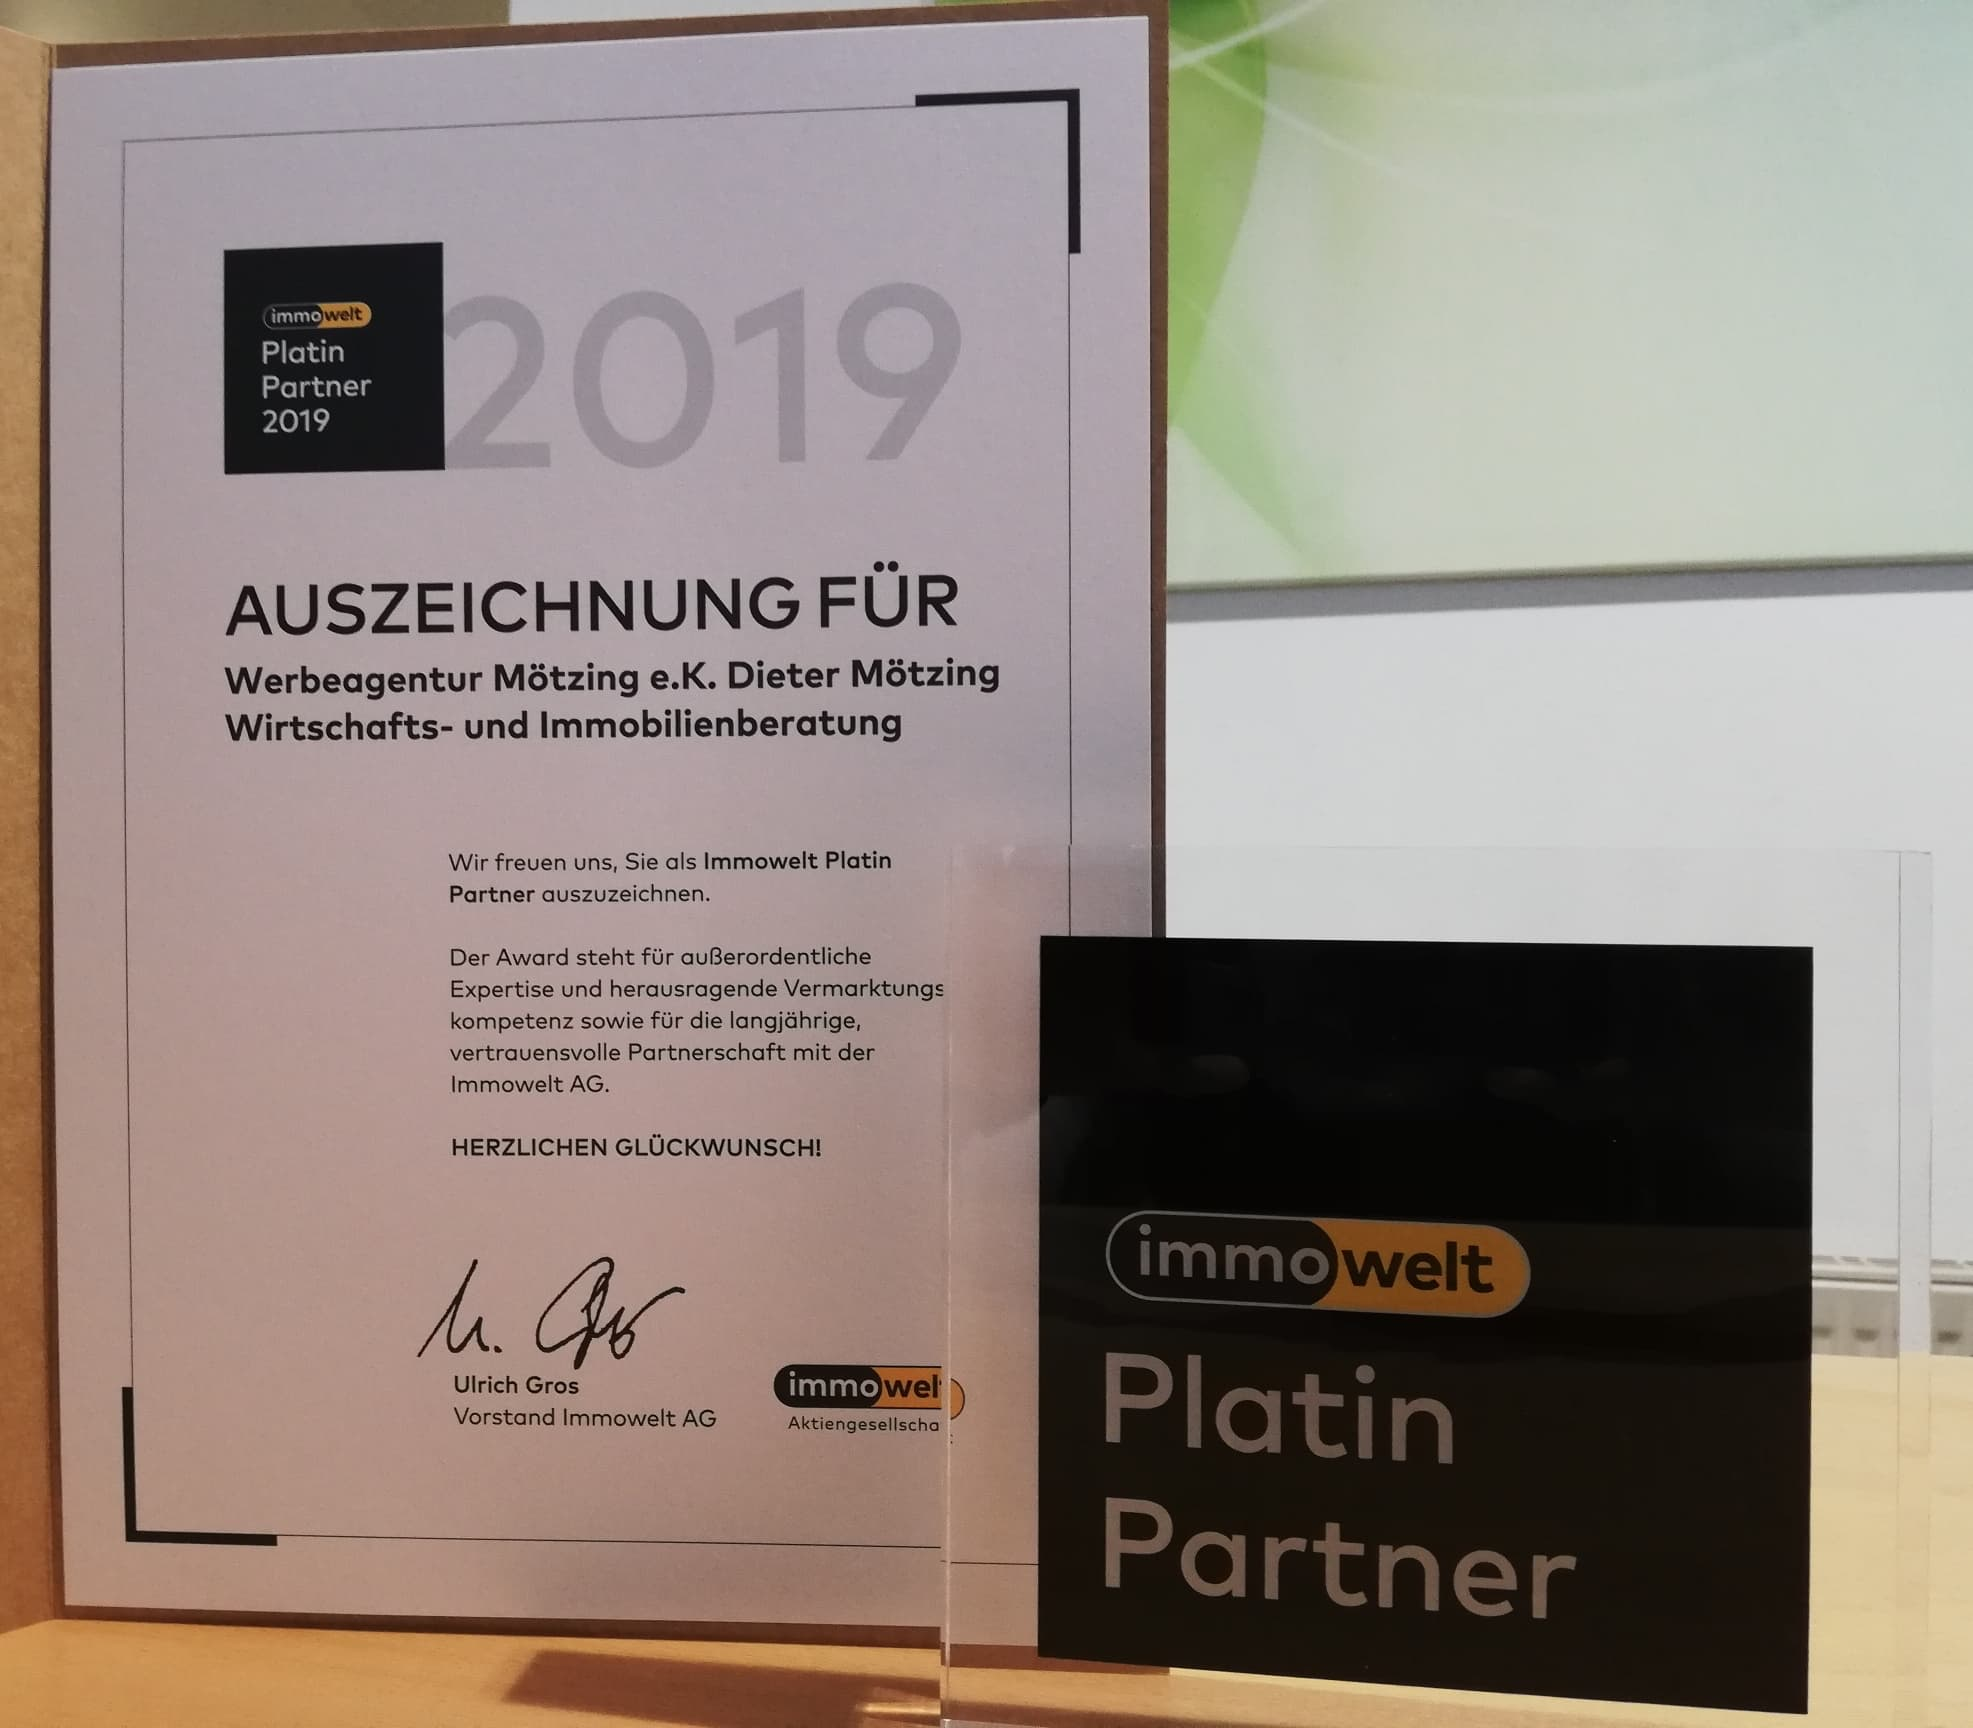 Immowelt-Partner Werbeagentur M�tzing e.K.